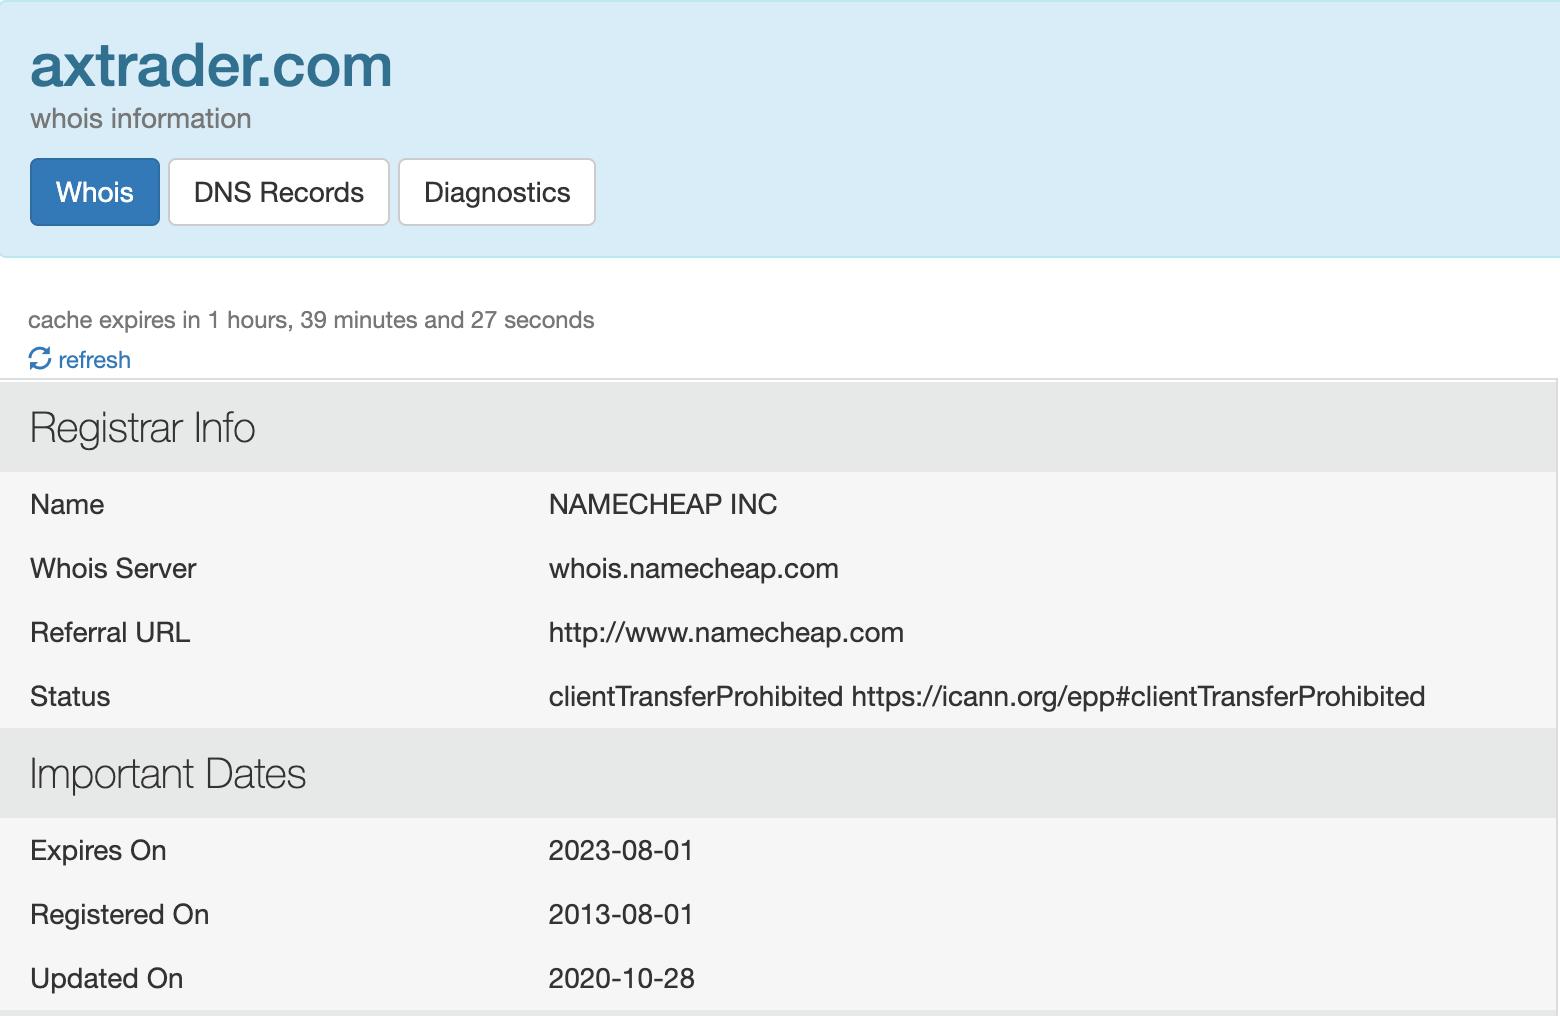 AXTrader Domain